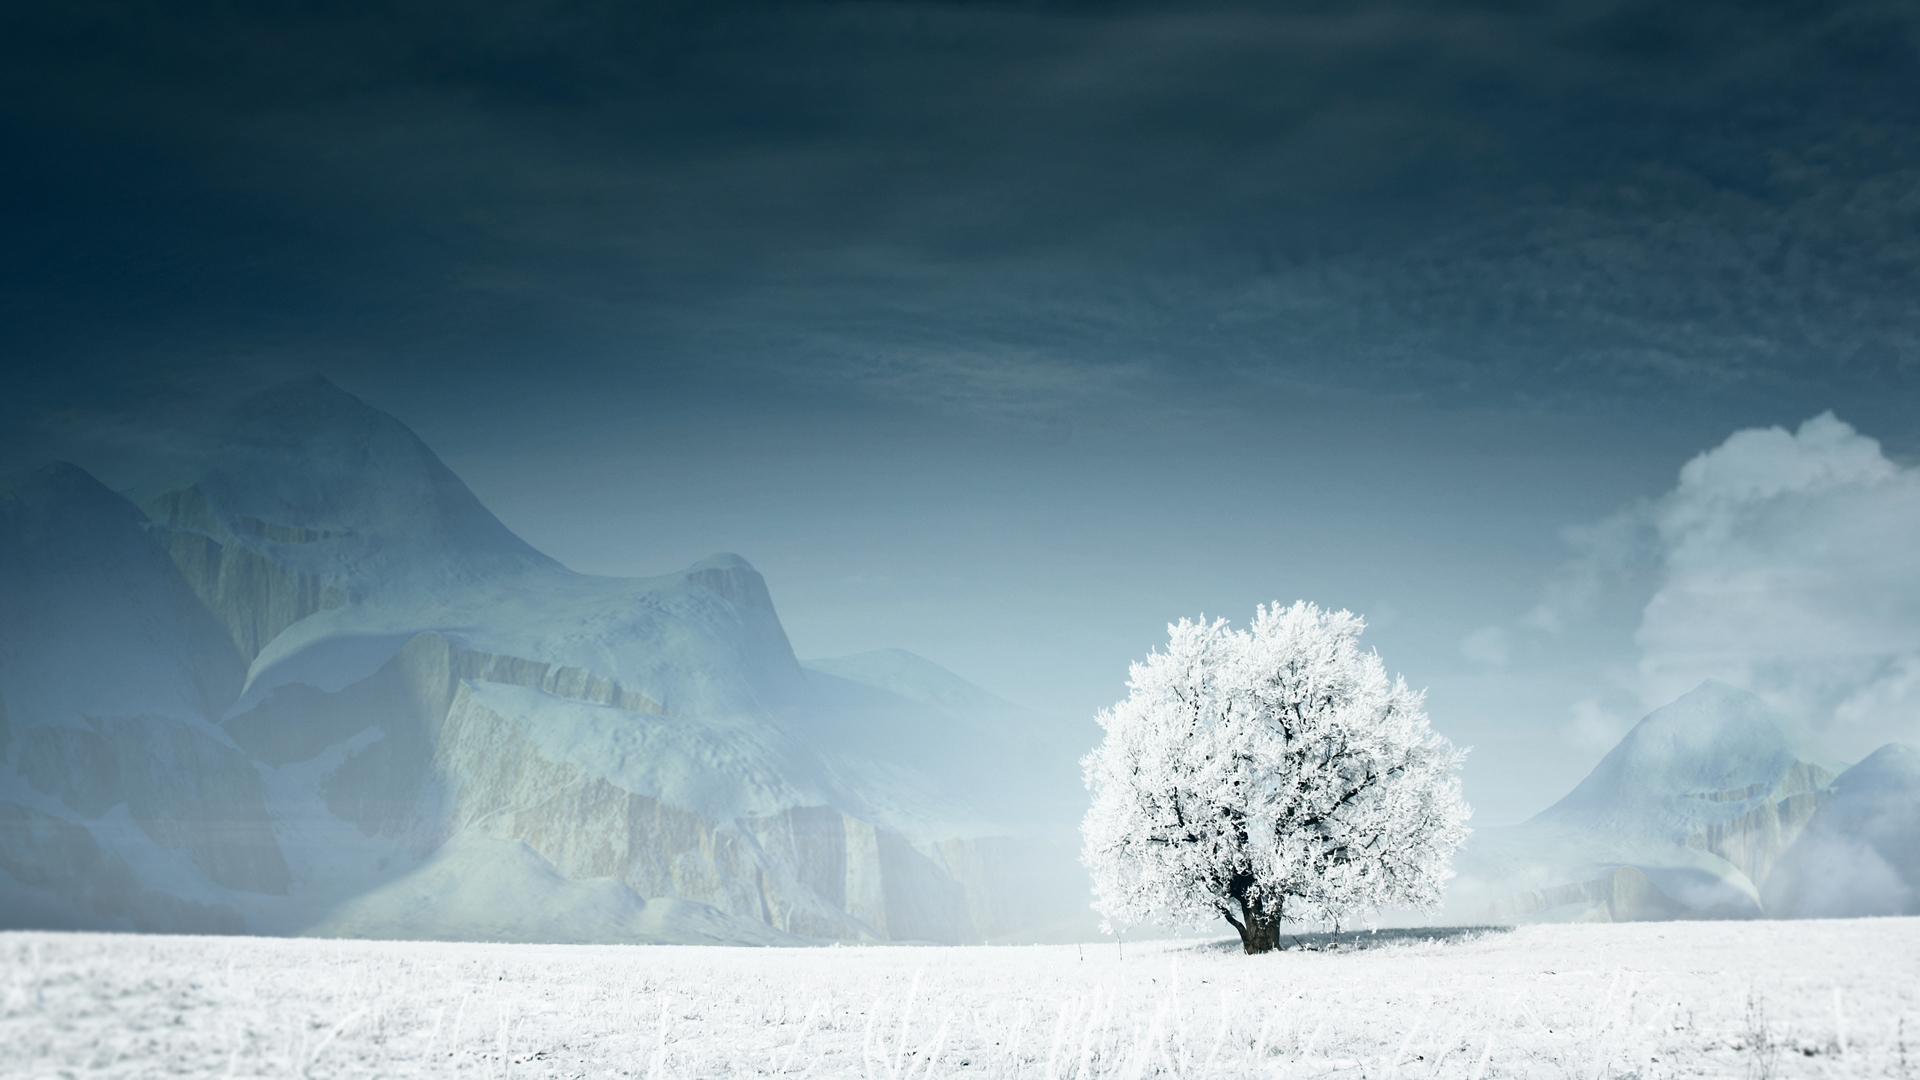 Snow Wallpaper HD Free Download